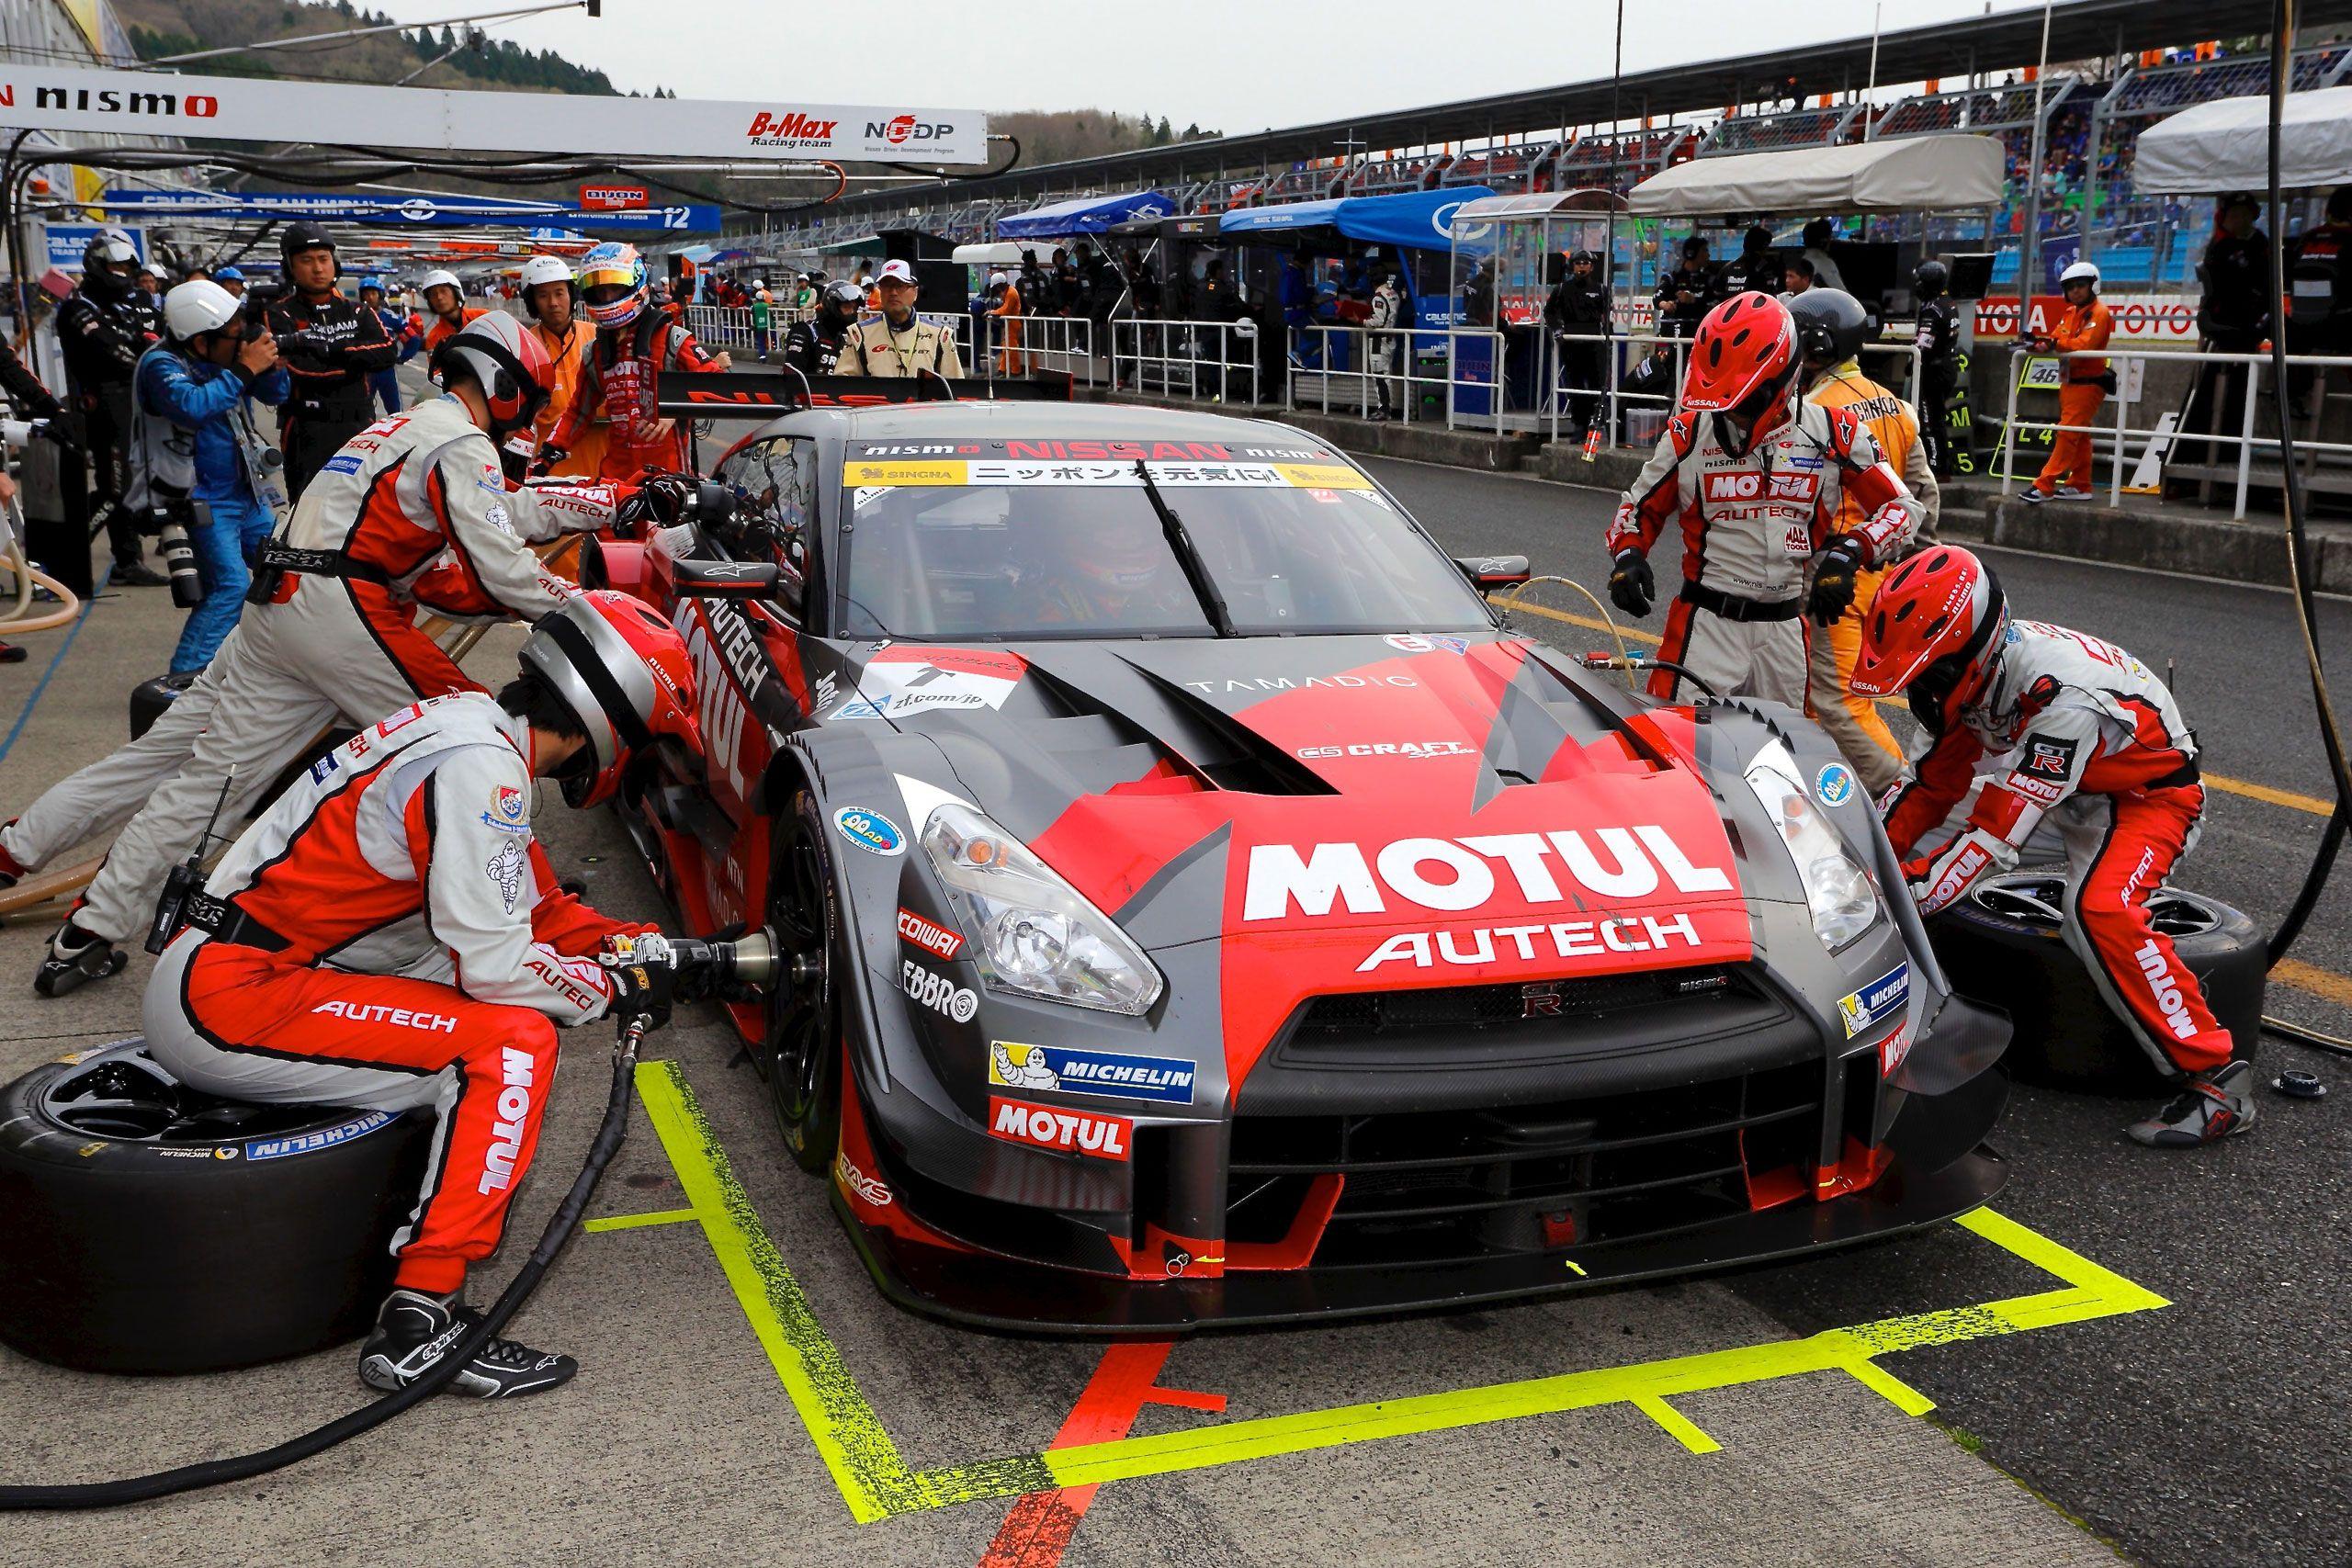 Nissan Gt R Super Gt Race Car Wallpaper Hd Car Wallpapers モータースポーツ